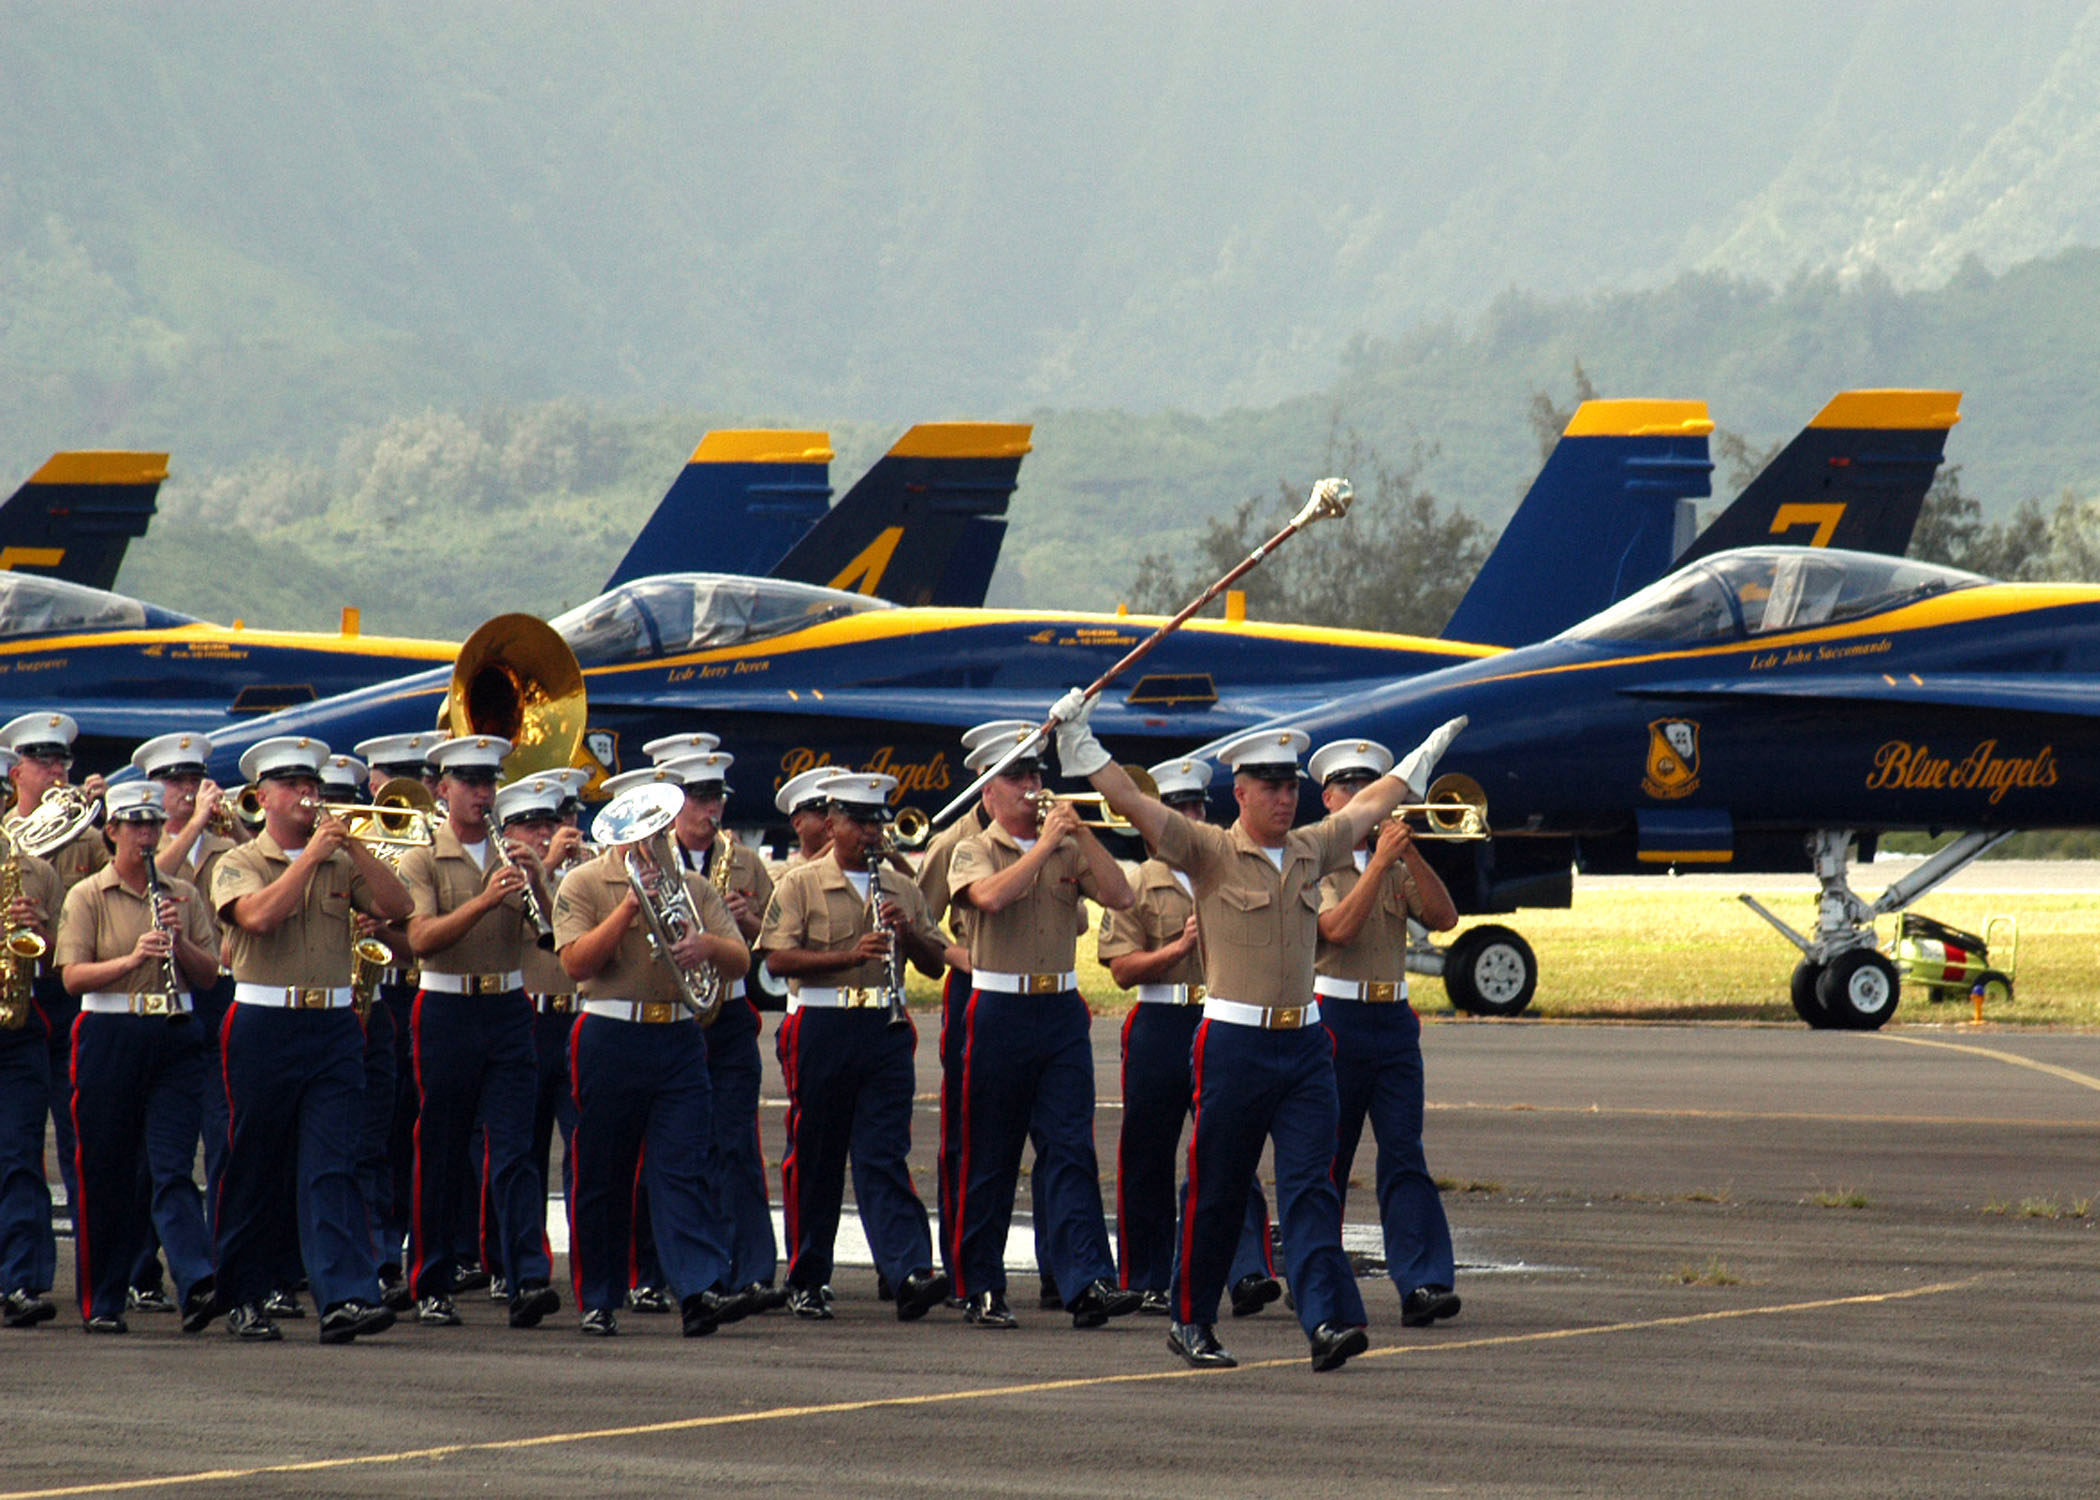 File:US Navy 041009-N-4995T-052 The U.S. Marine Corps band ...